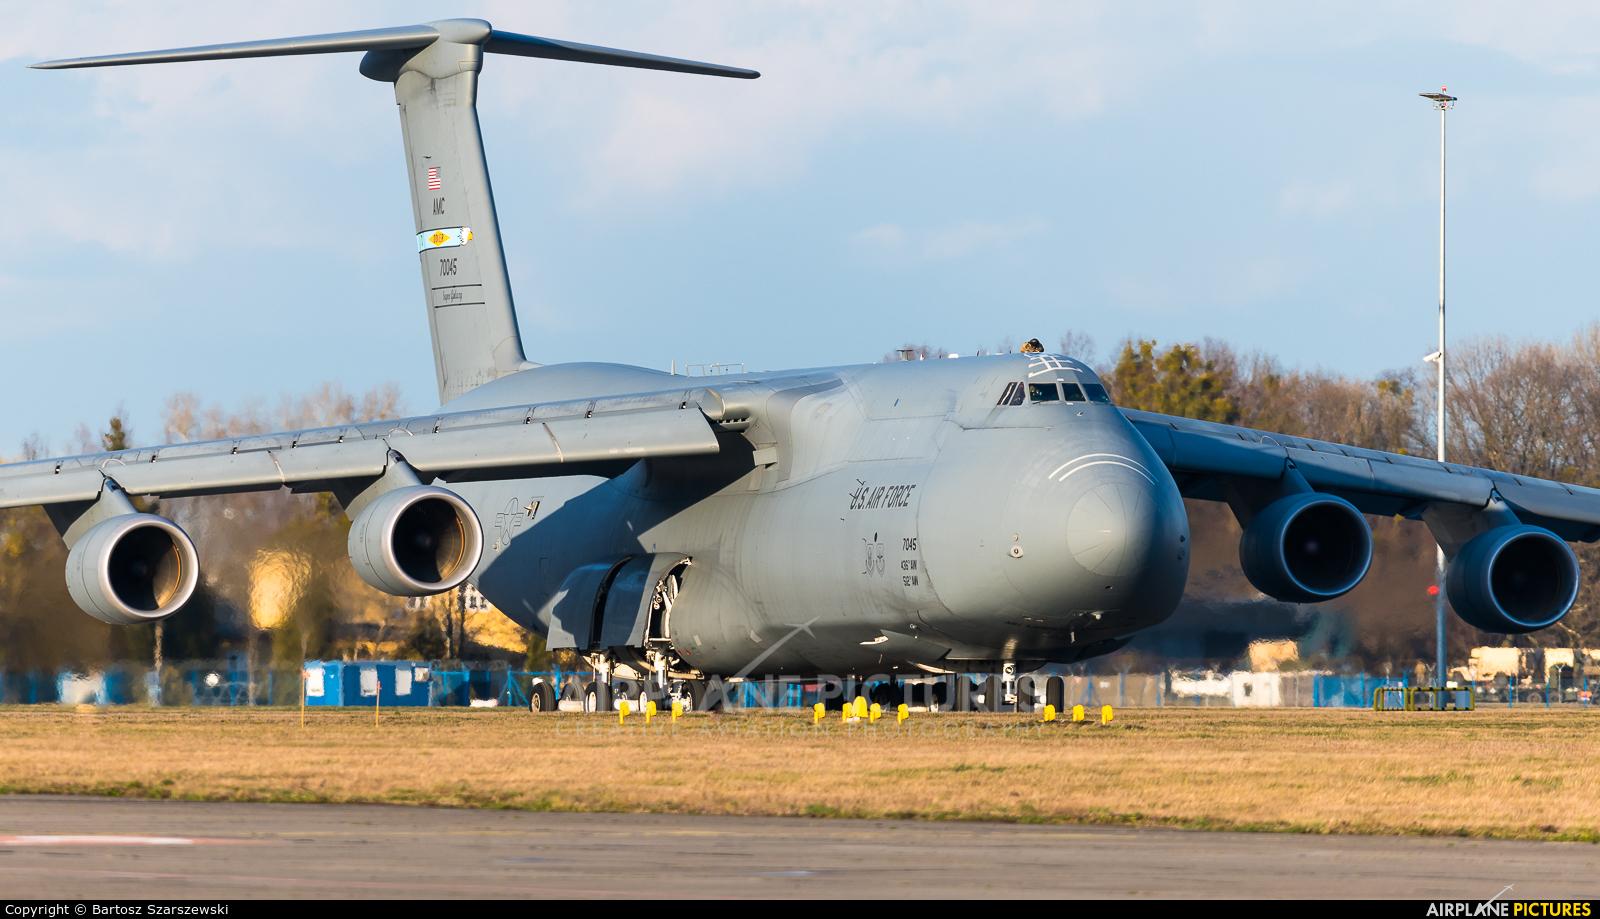 USA - Air Force 87-0045 aircraft at Wrocław - Copernicus